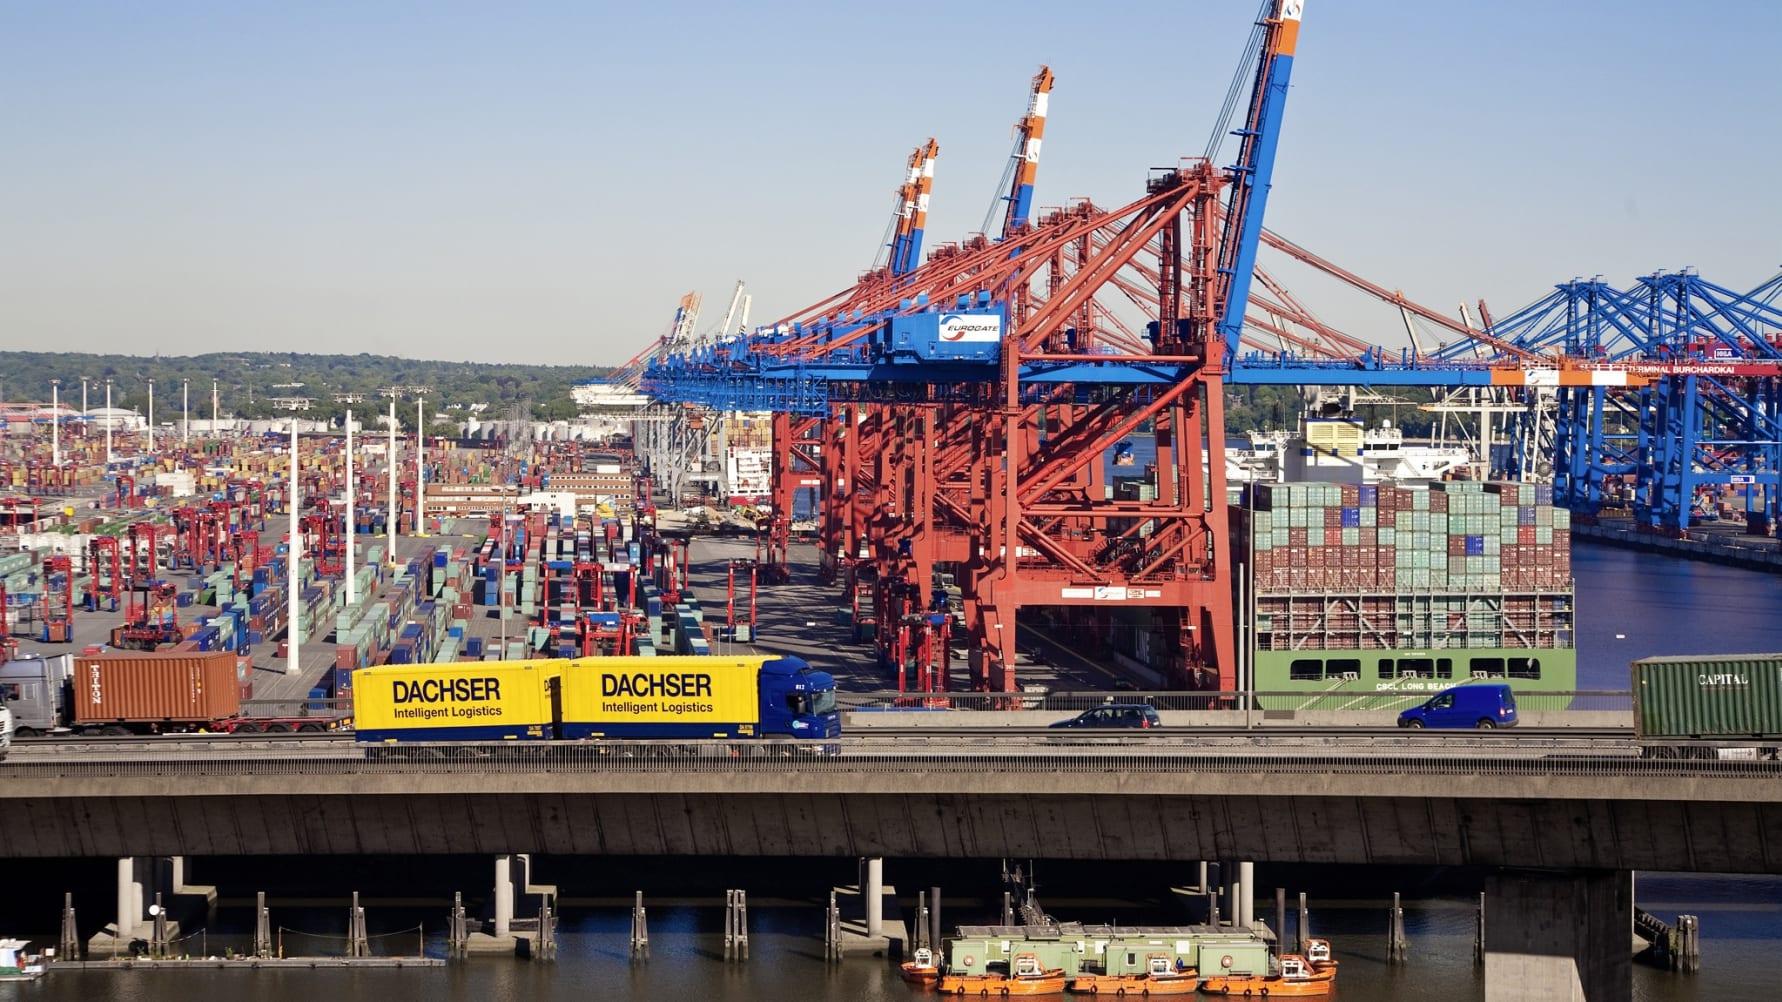 Dachser Air & Sea Logistics omorganiserer regional ledelse